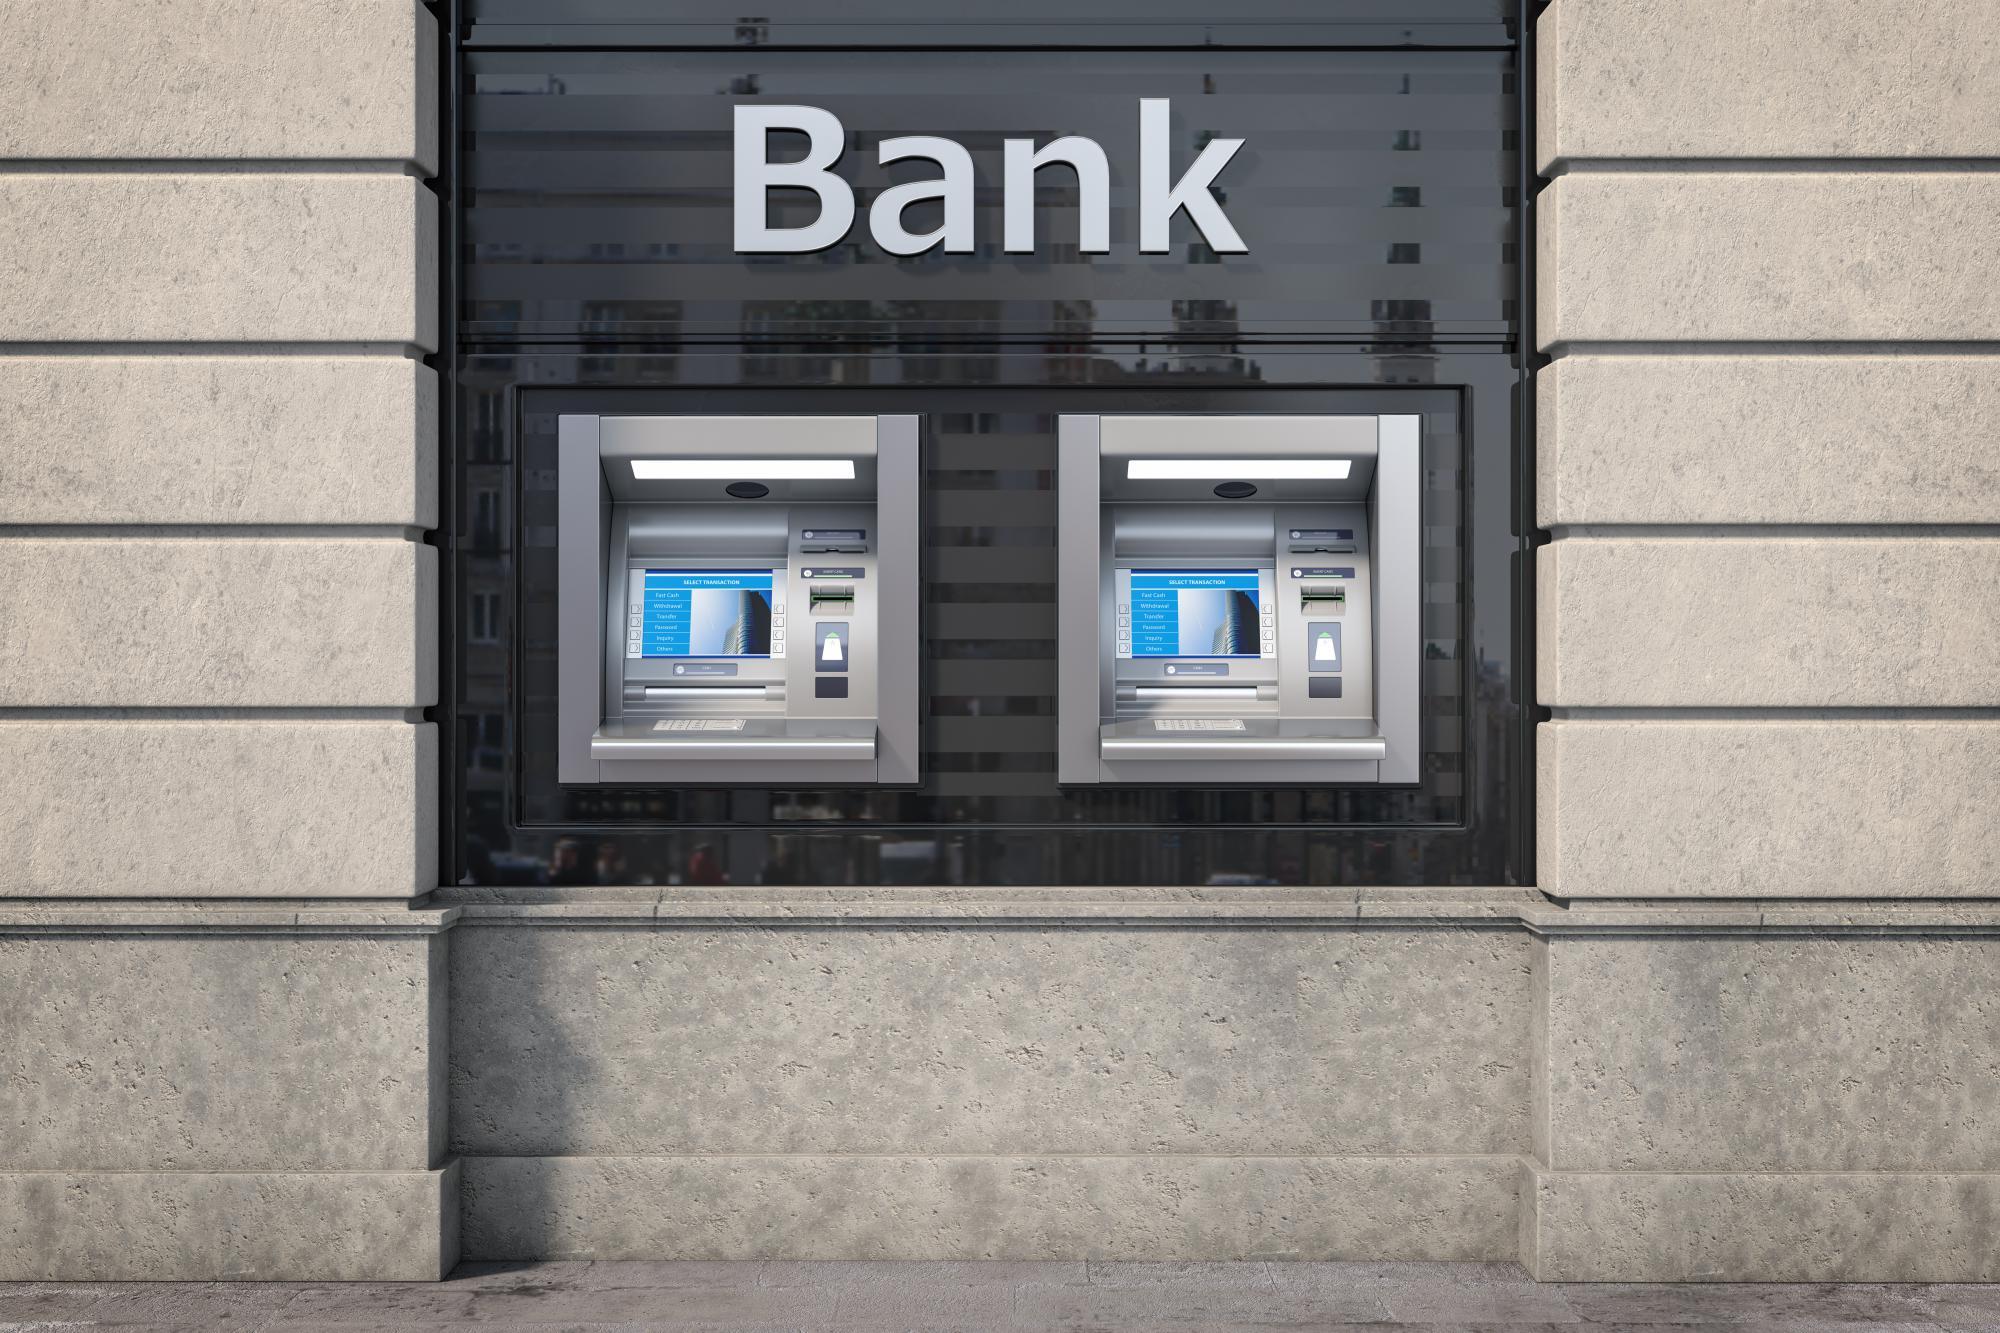 От банка незаконно требуют сведения о клиентах